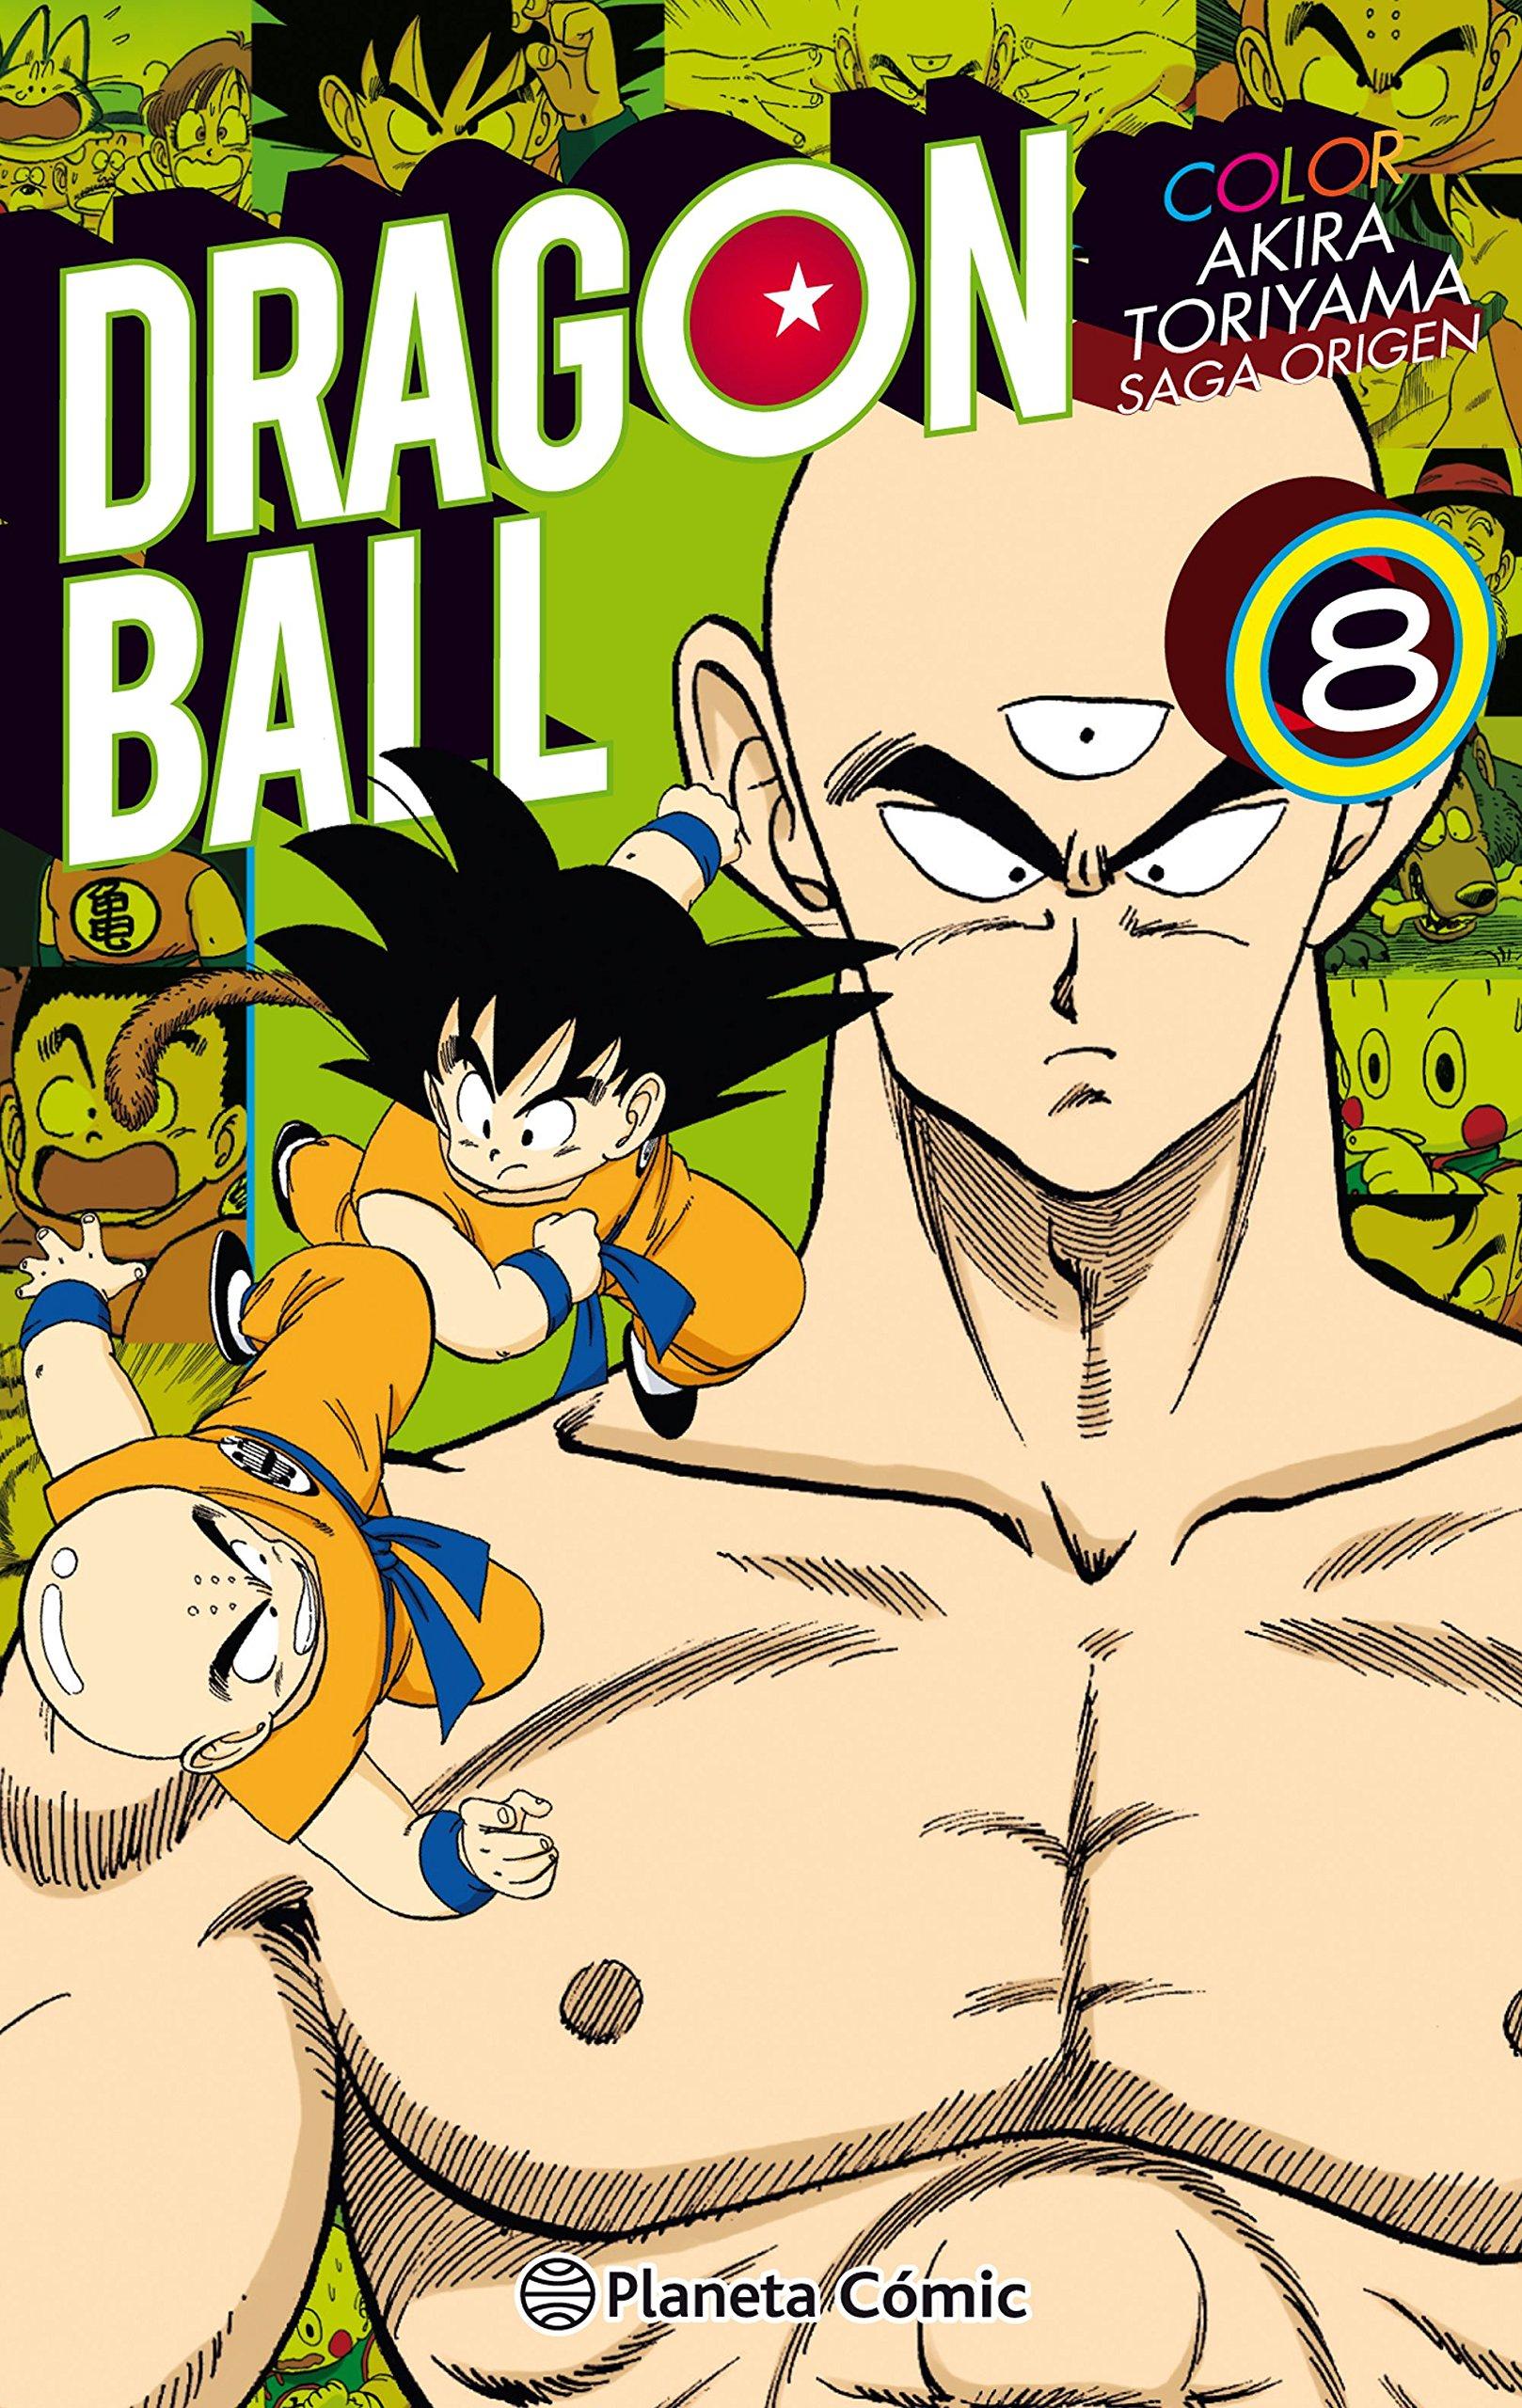 Dragon Ball Color Origen y Red Ribbon nº 08/08 (Manga Shonen) Tapa blanda – 18 sep 2018 Akira Toriyama Daruma Planeta DeAgostini Cómics 8491468250